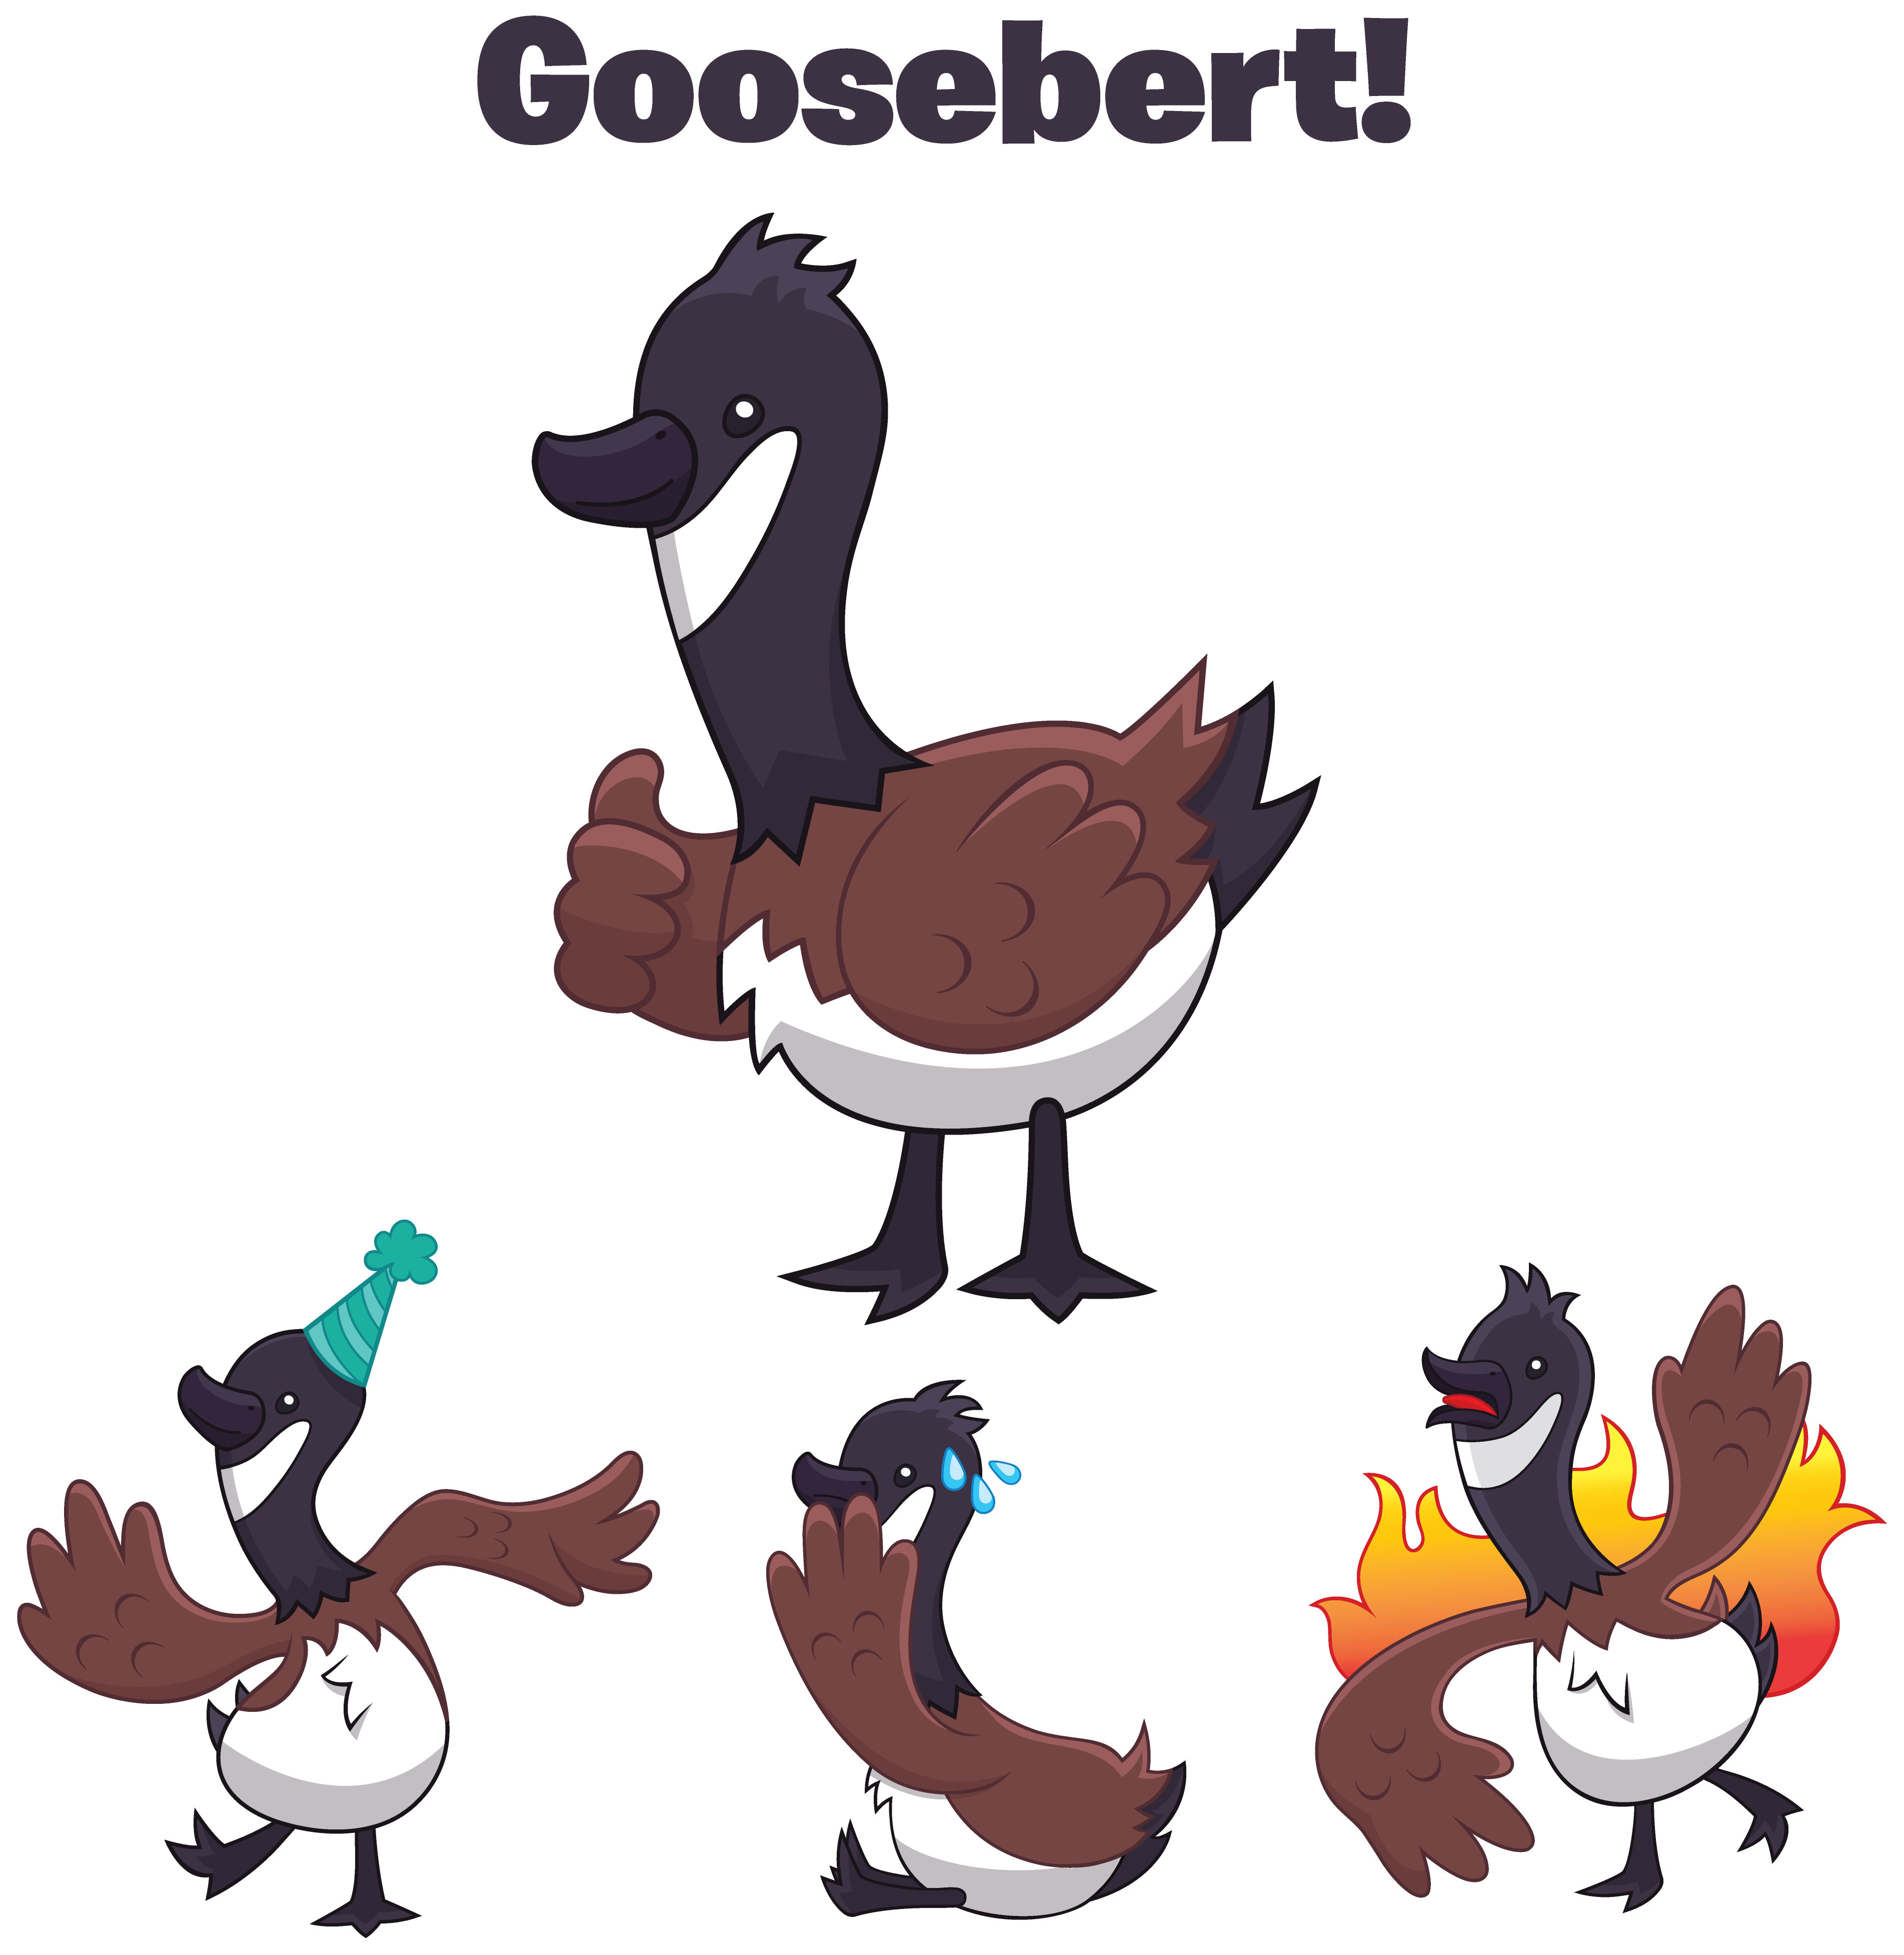 Goosebert